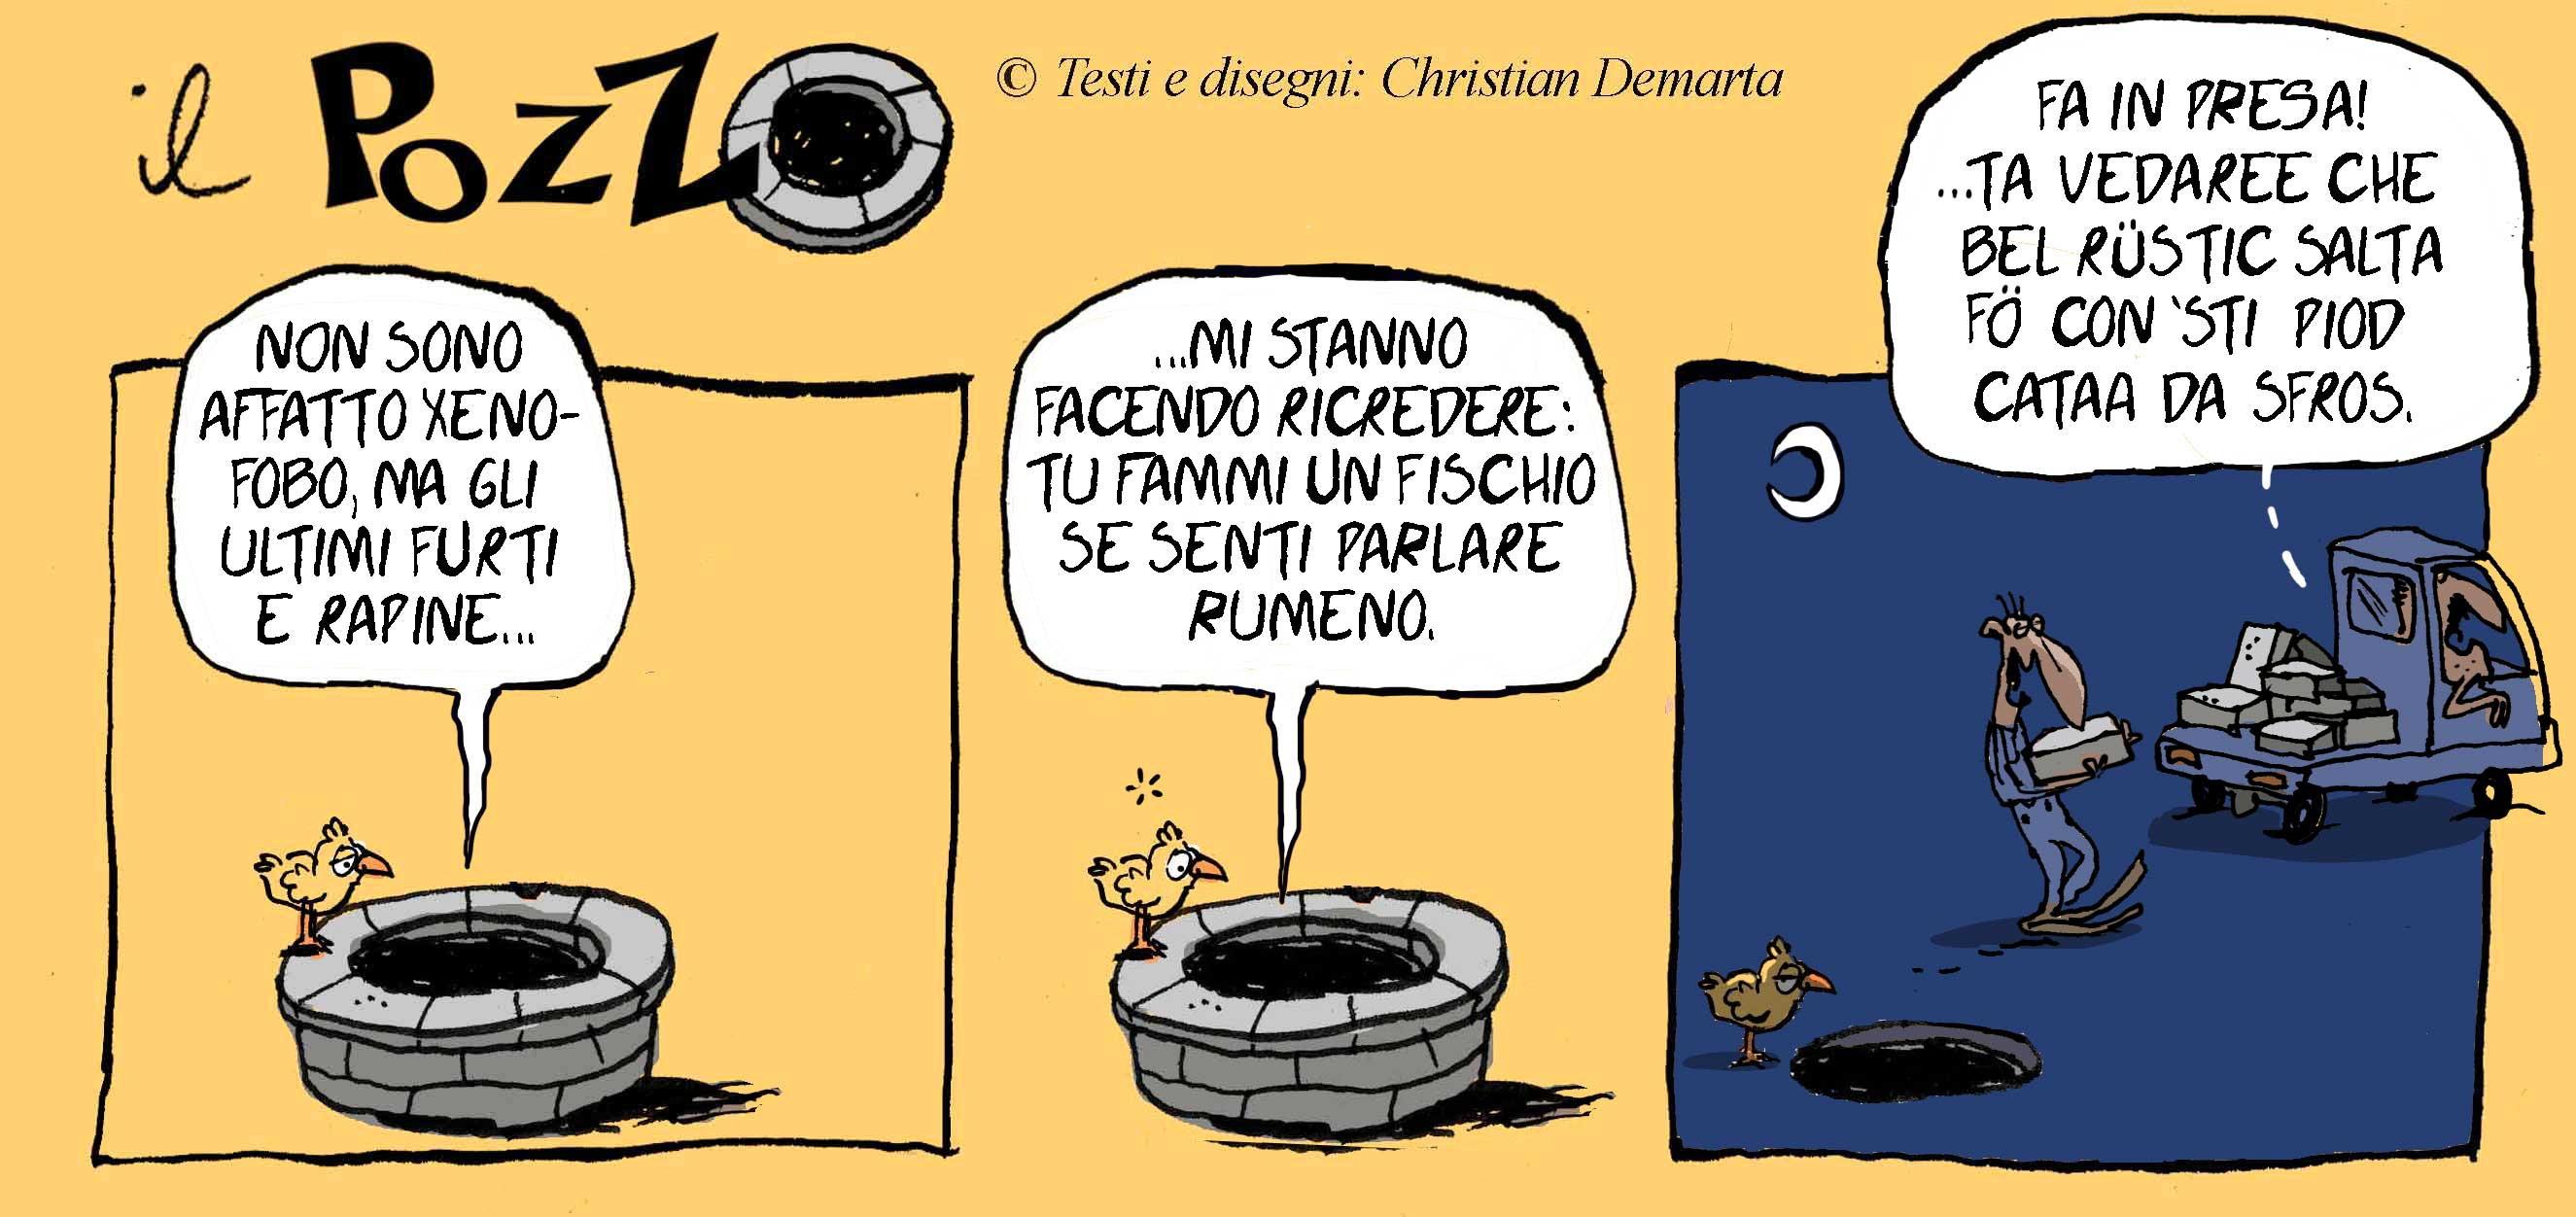 Parlare rumeno